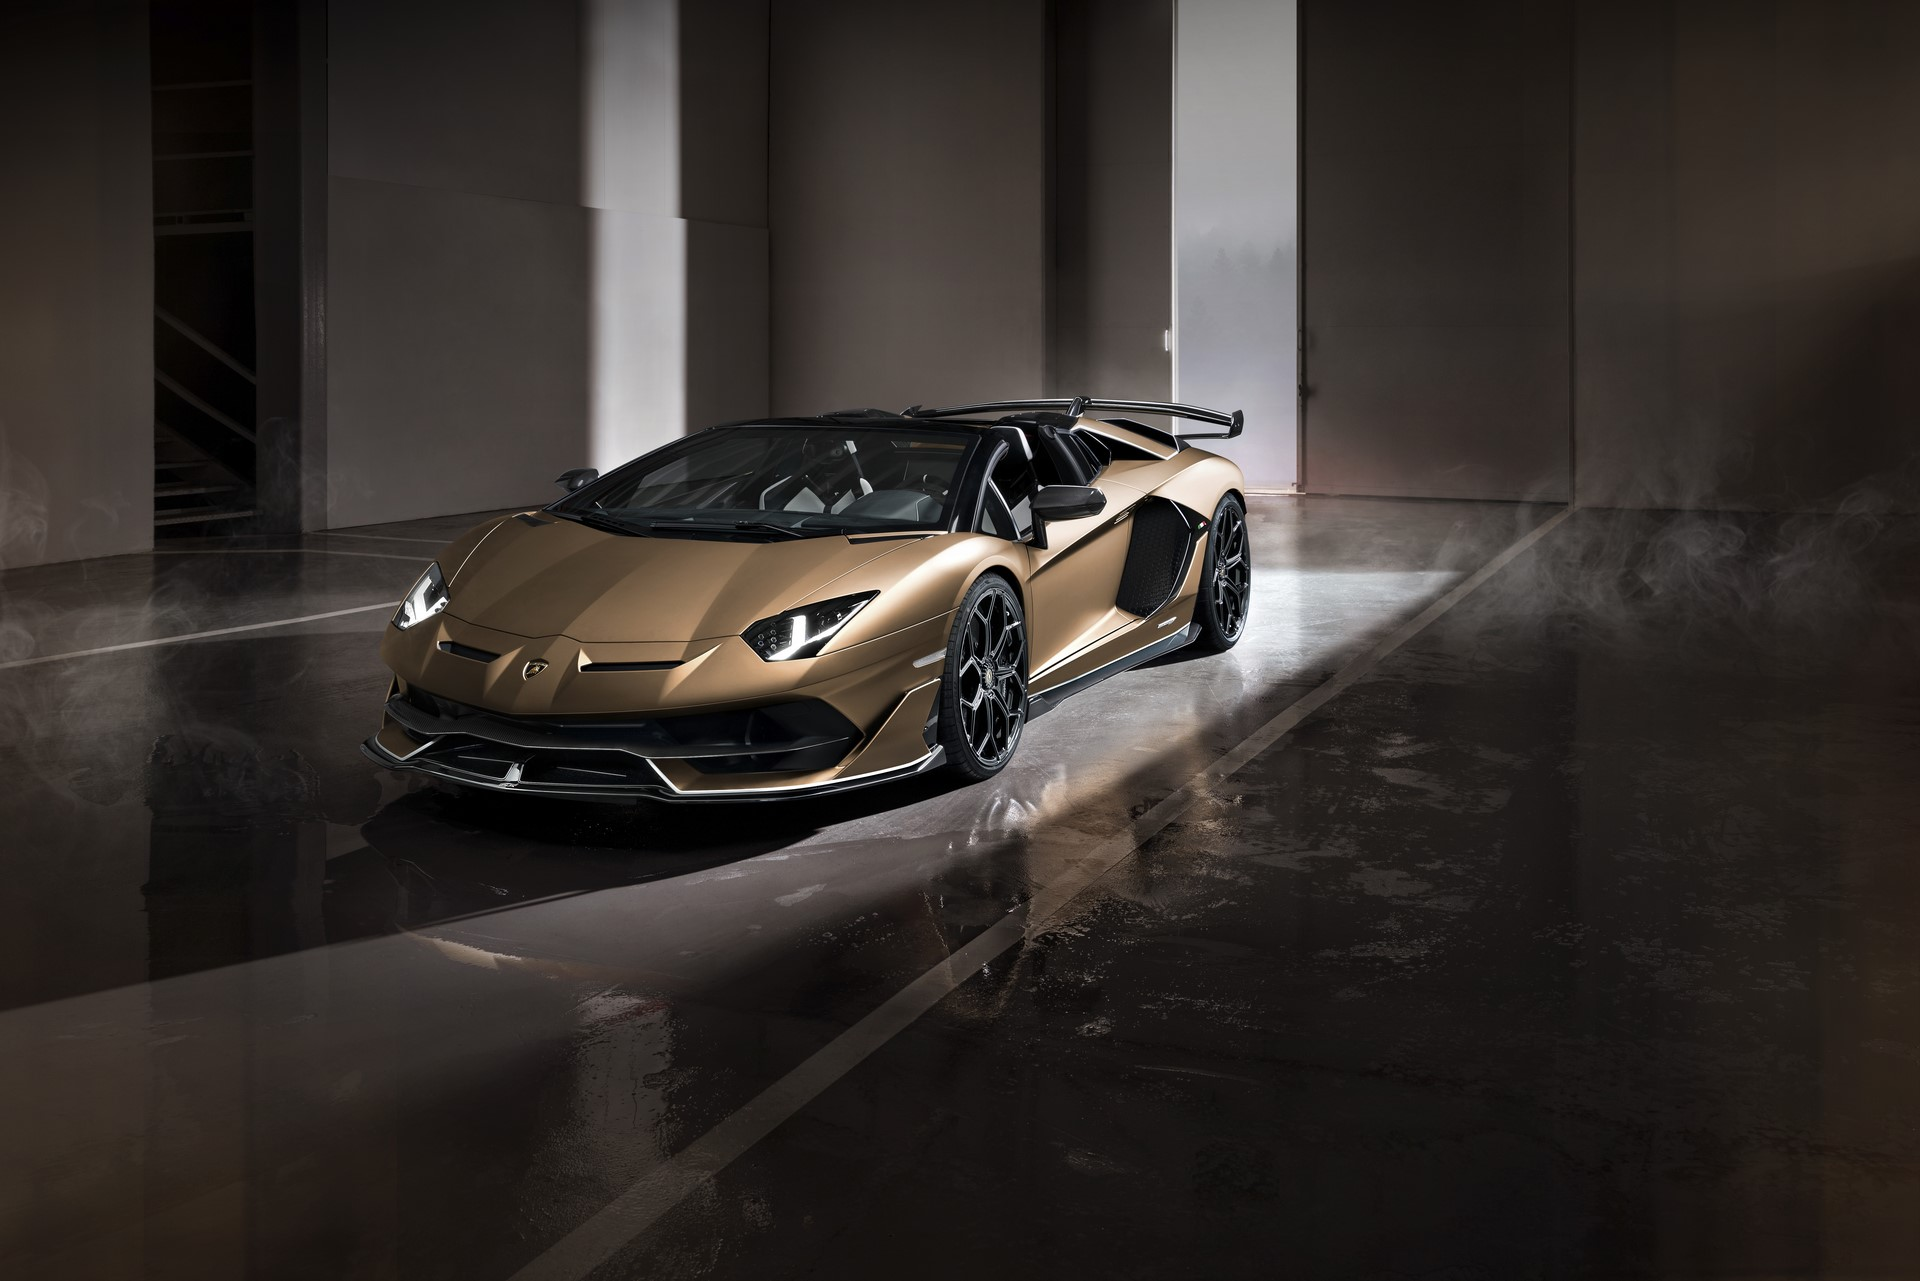 Lamborghini Aventador SVJ Roadster (5)